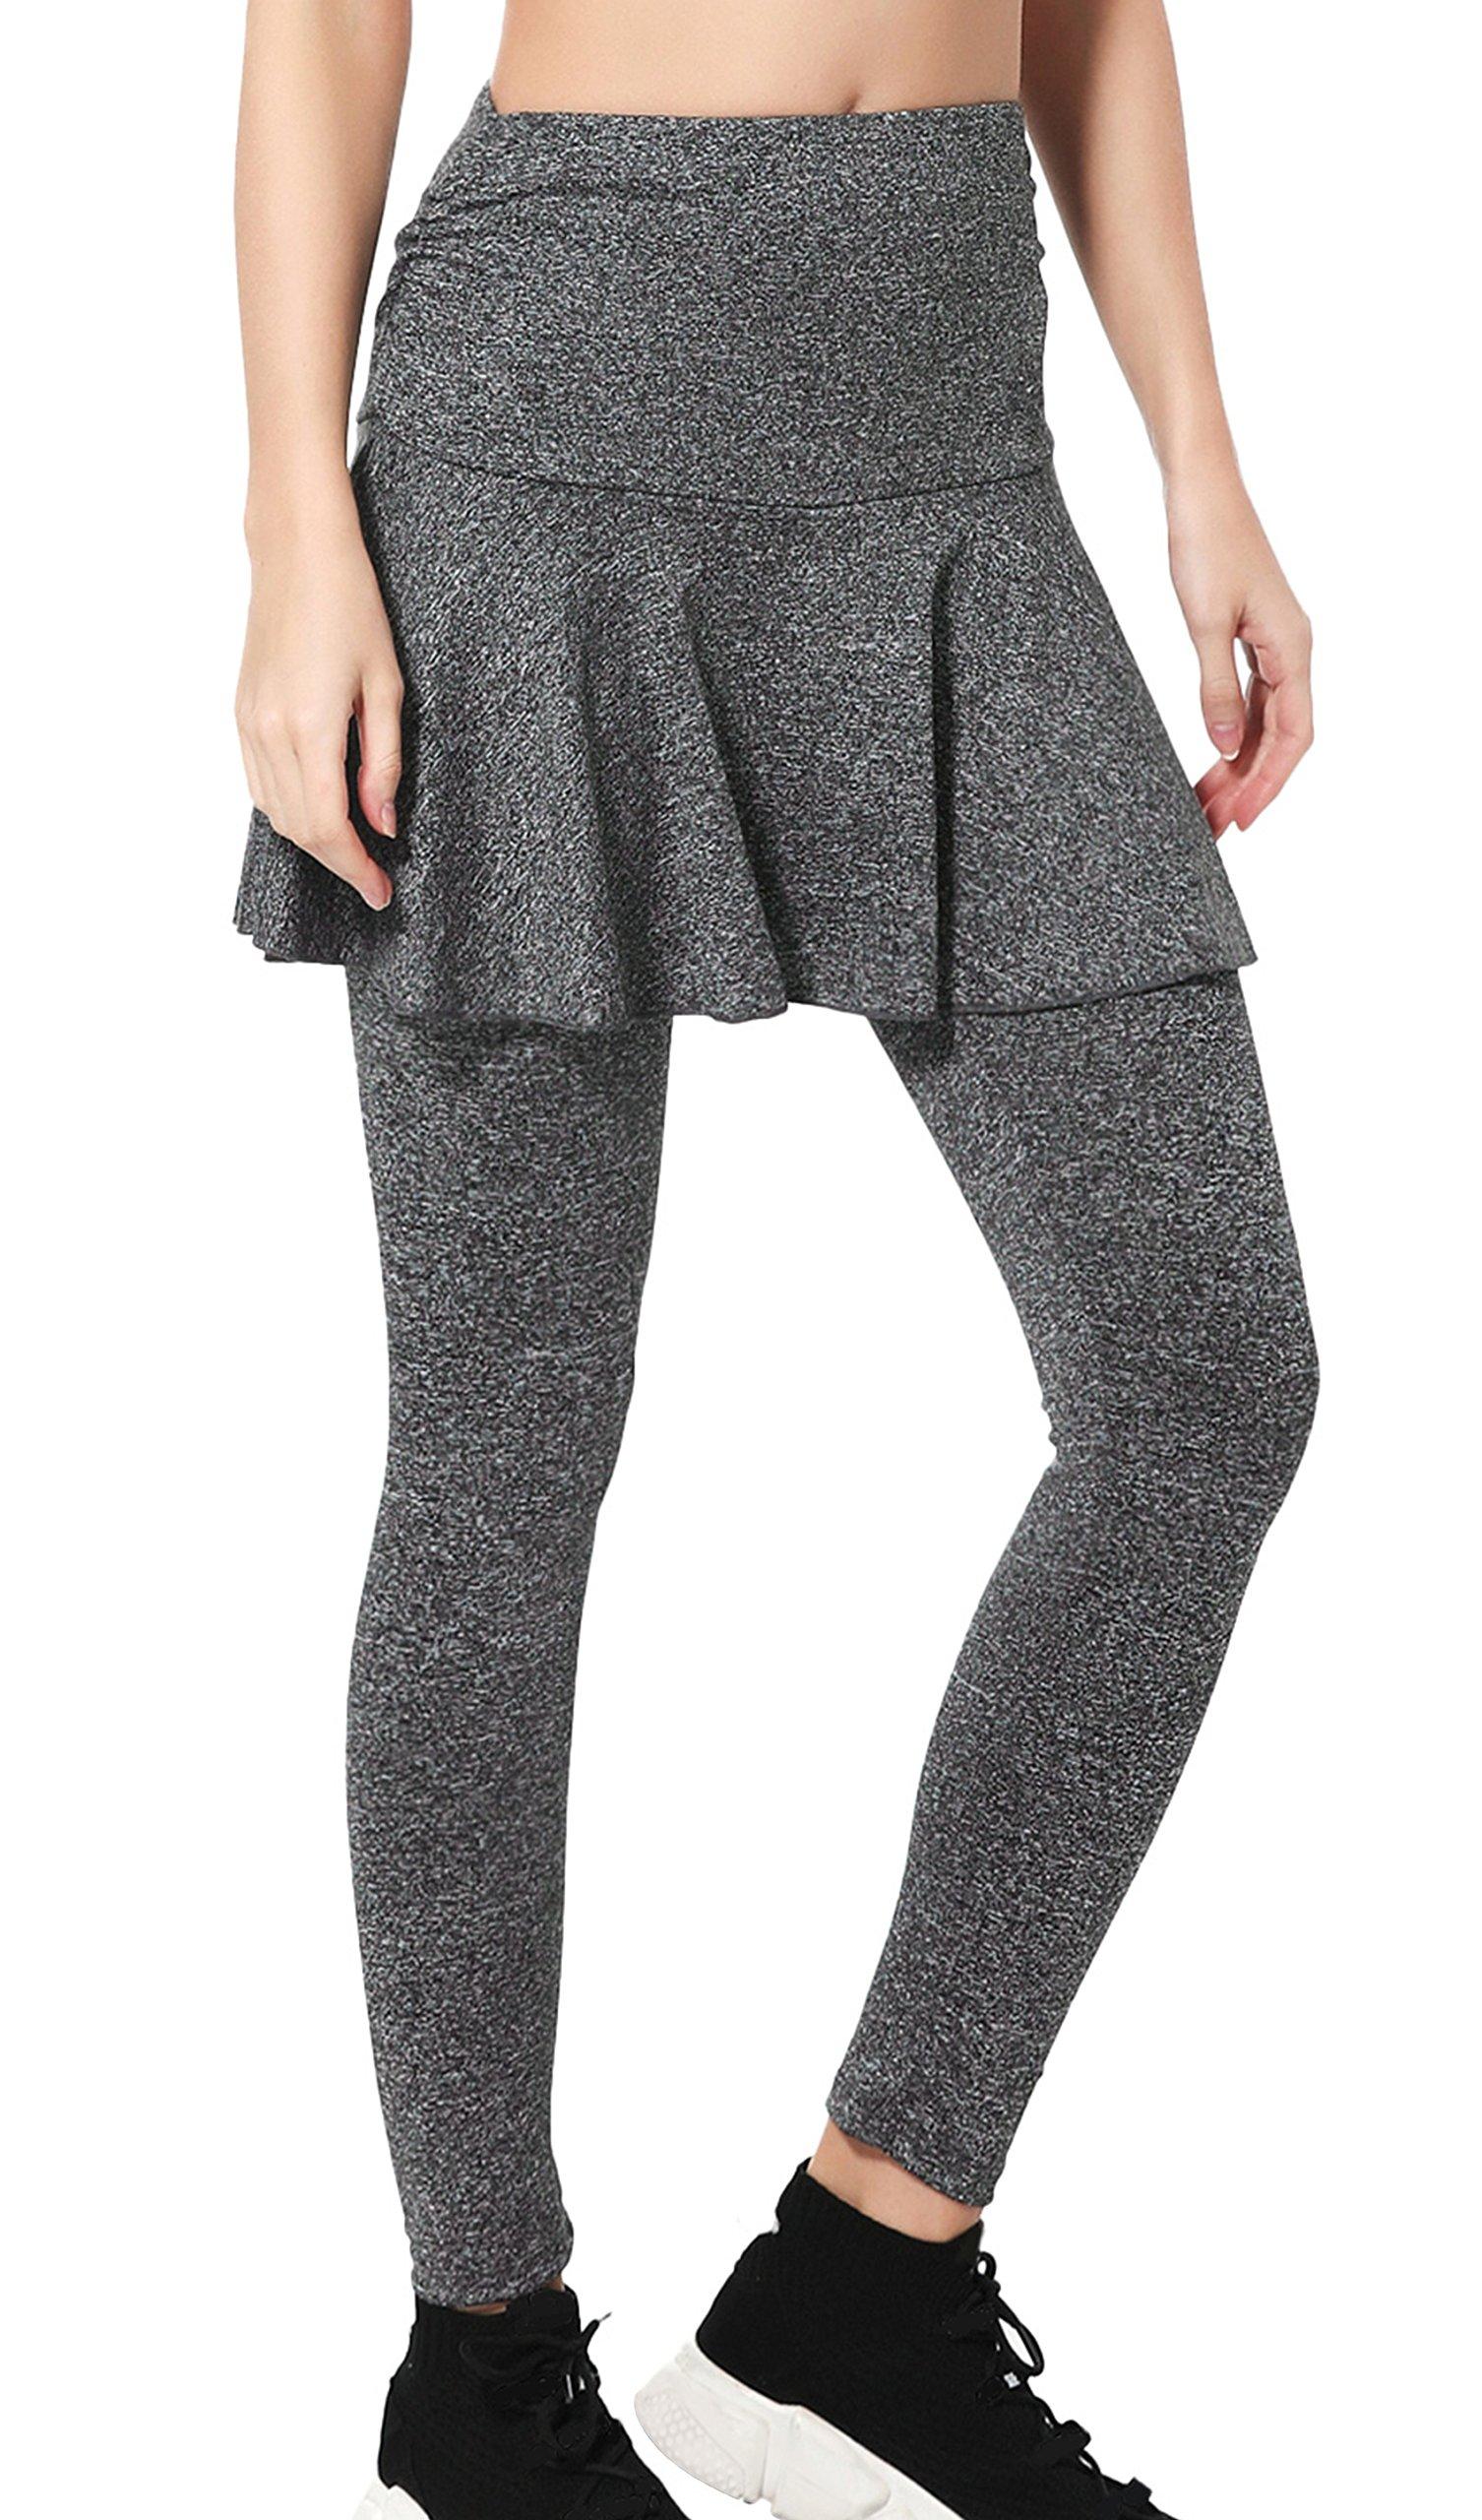 Wantdo Women's Gym Skirted Leggings Tight 4 Way Strech Shaping Hip Push up Yoga Pants Medium Grey by Wantdo